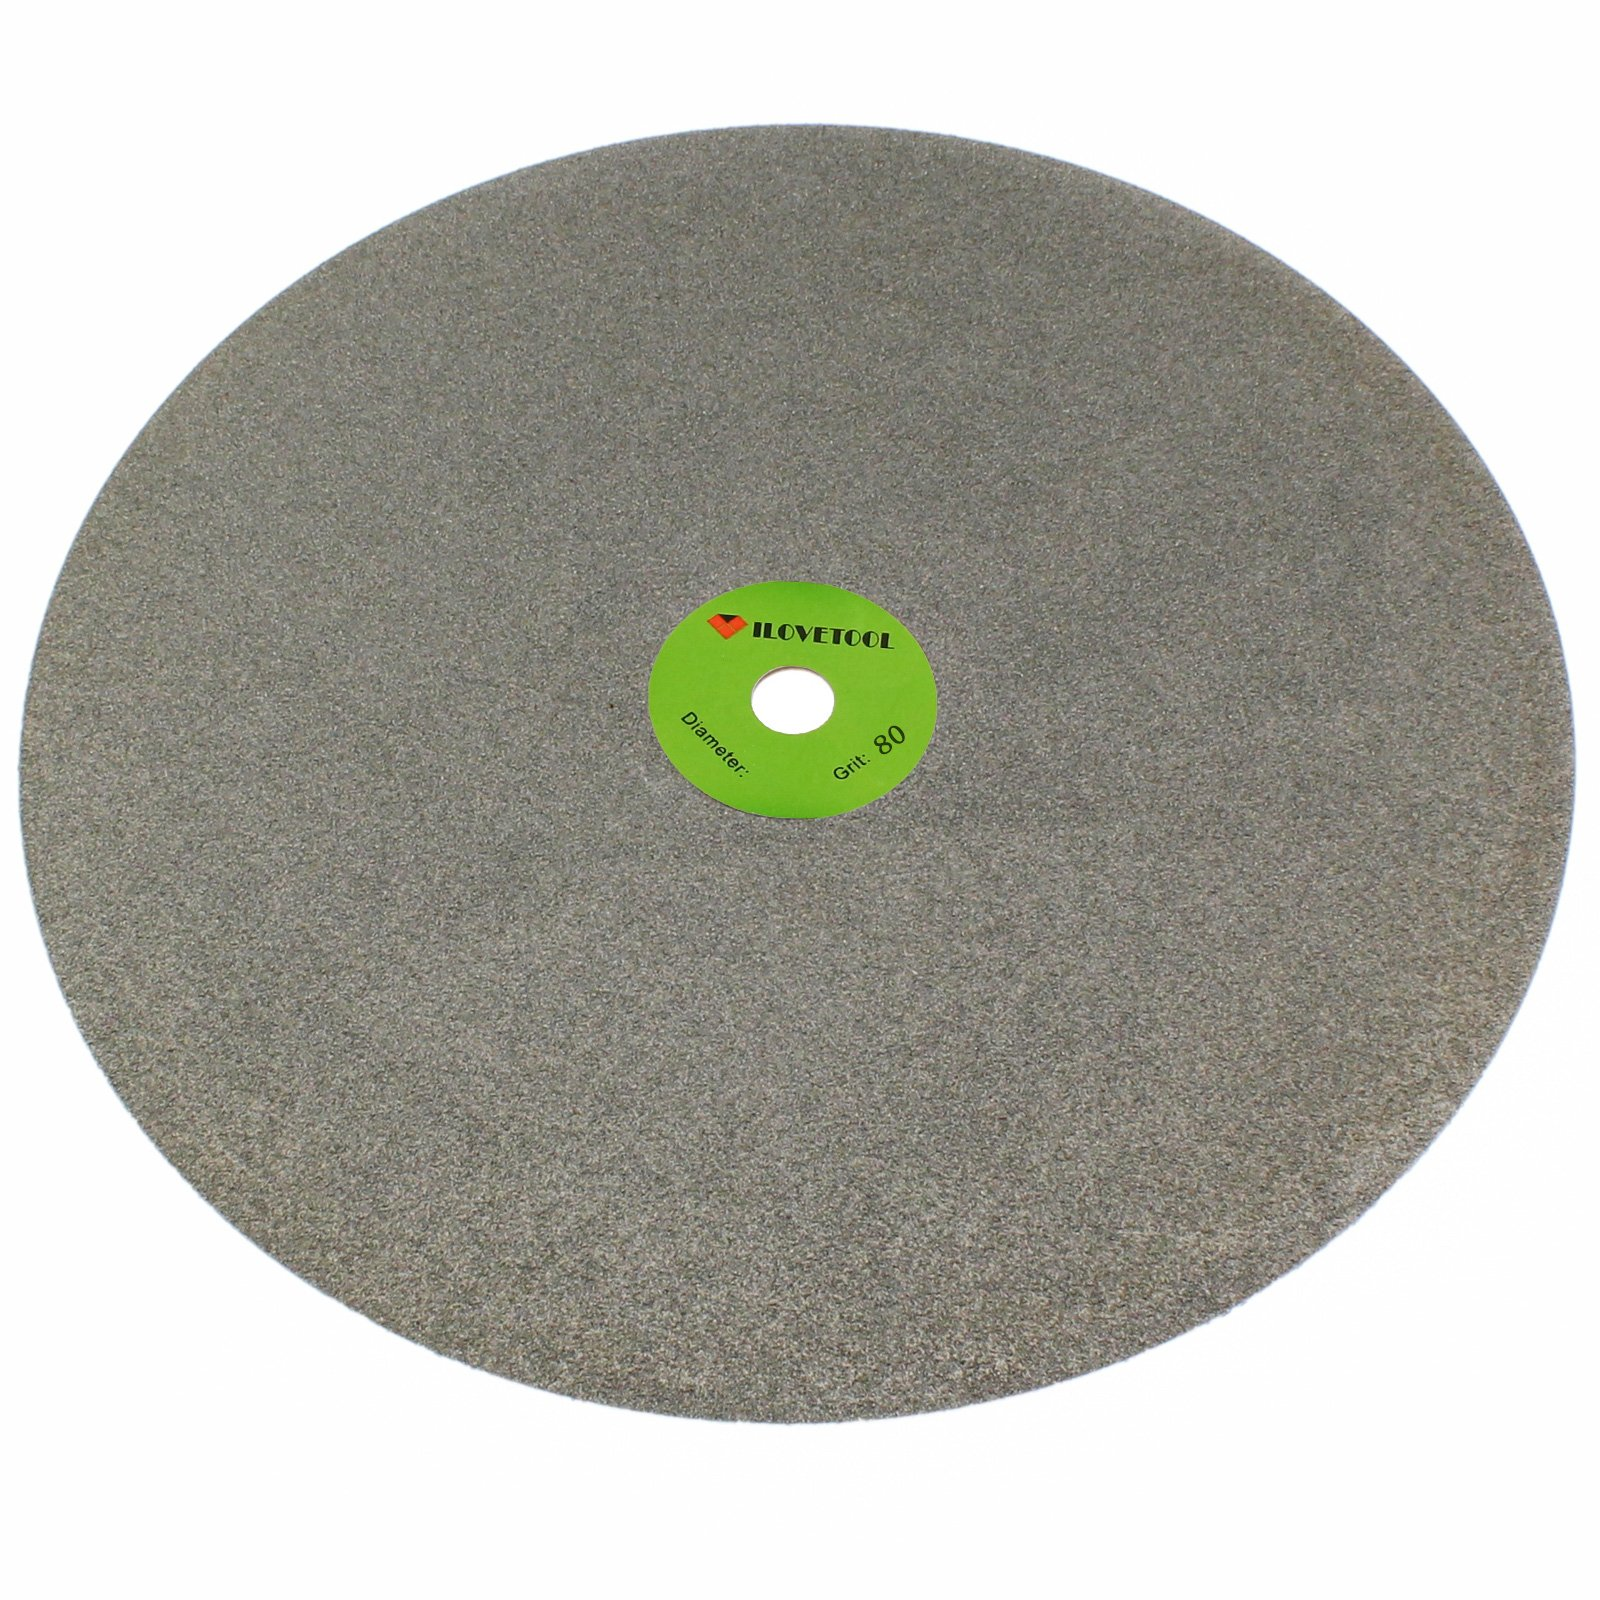 ILOVETOOL 20 inch 100 Grit Diamond Coated Flat Lap Disk Grinding Polishing Wheel